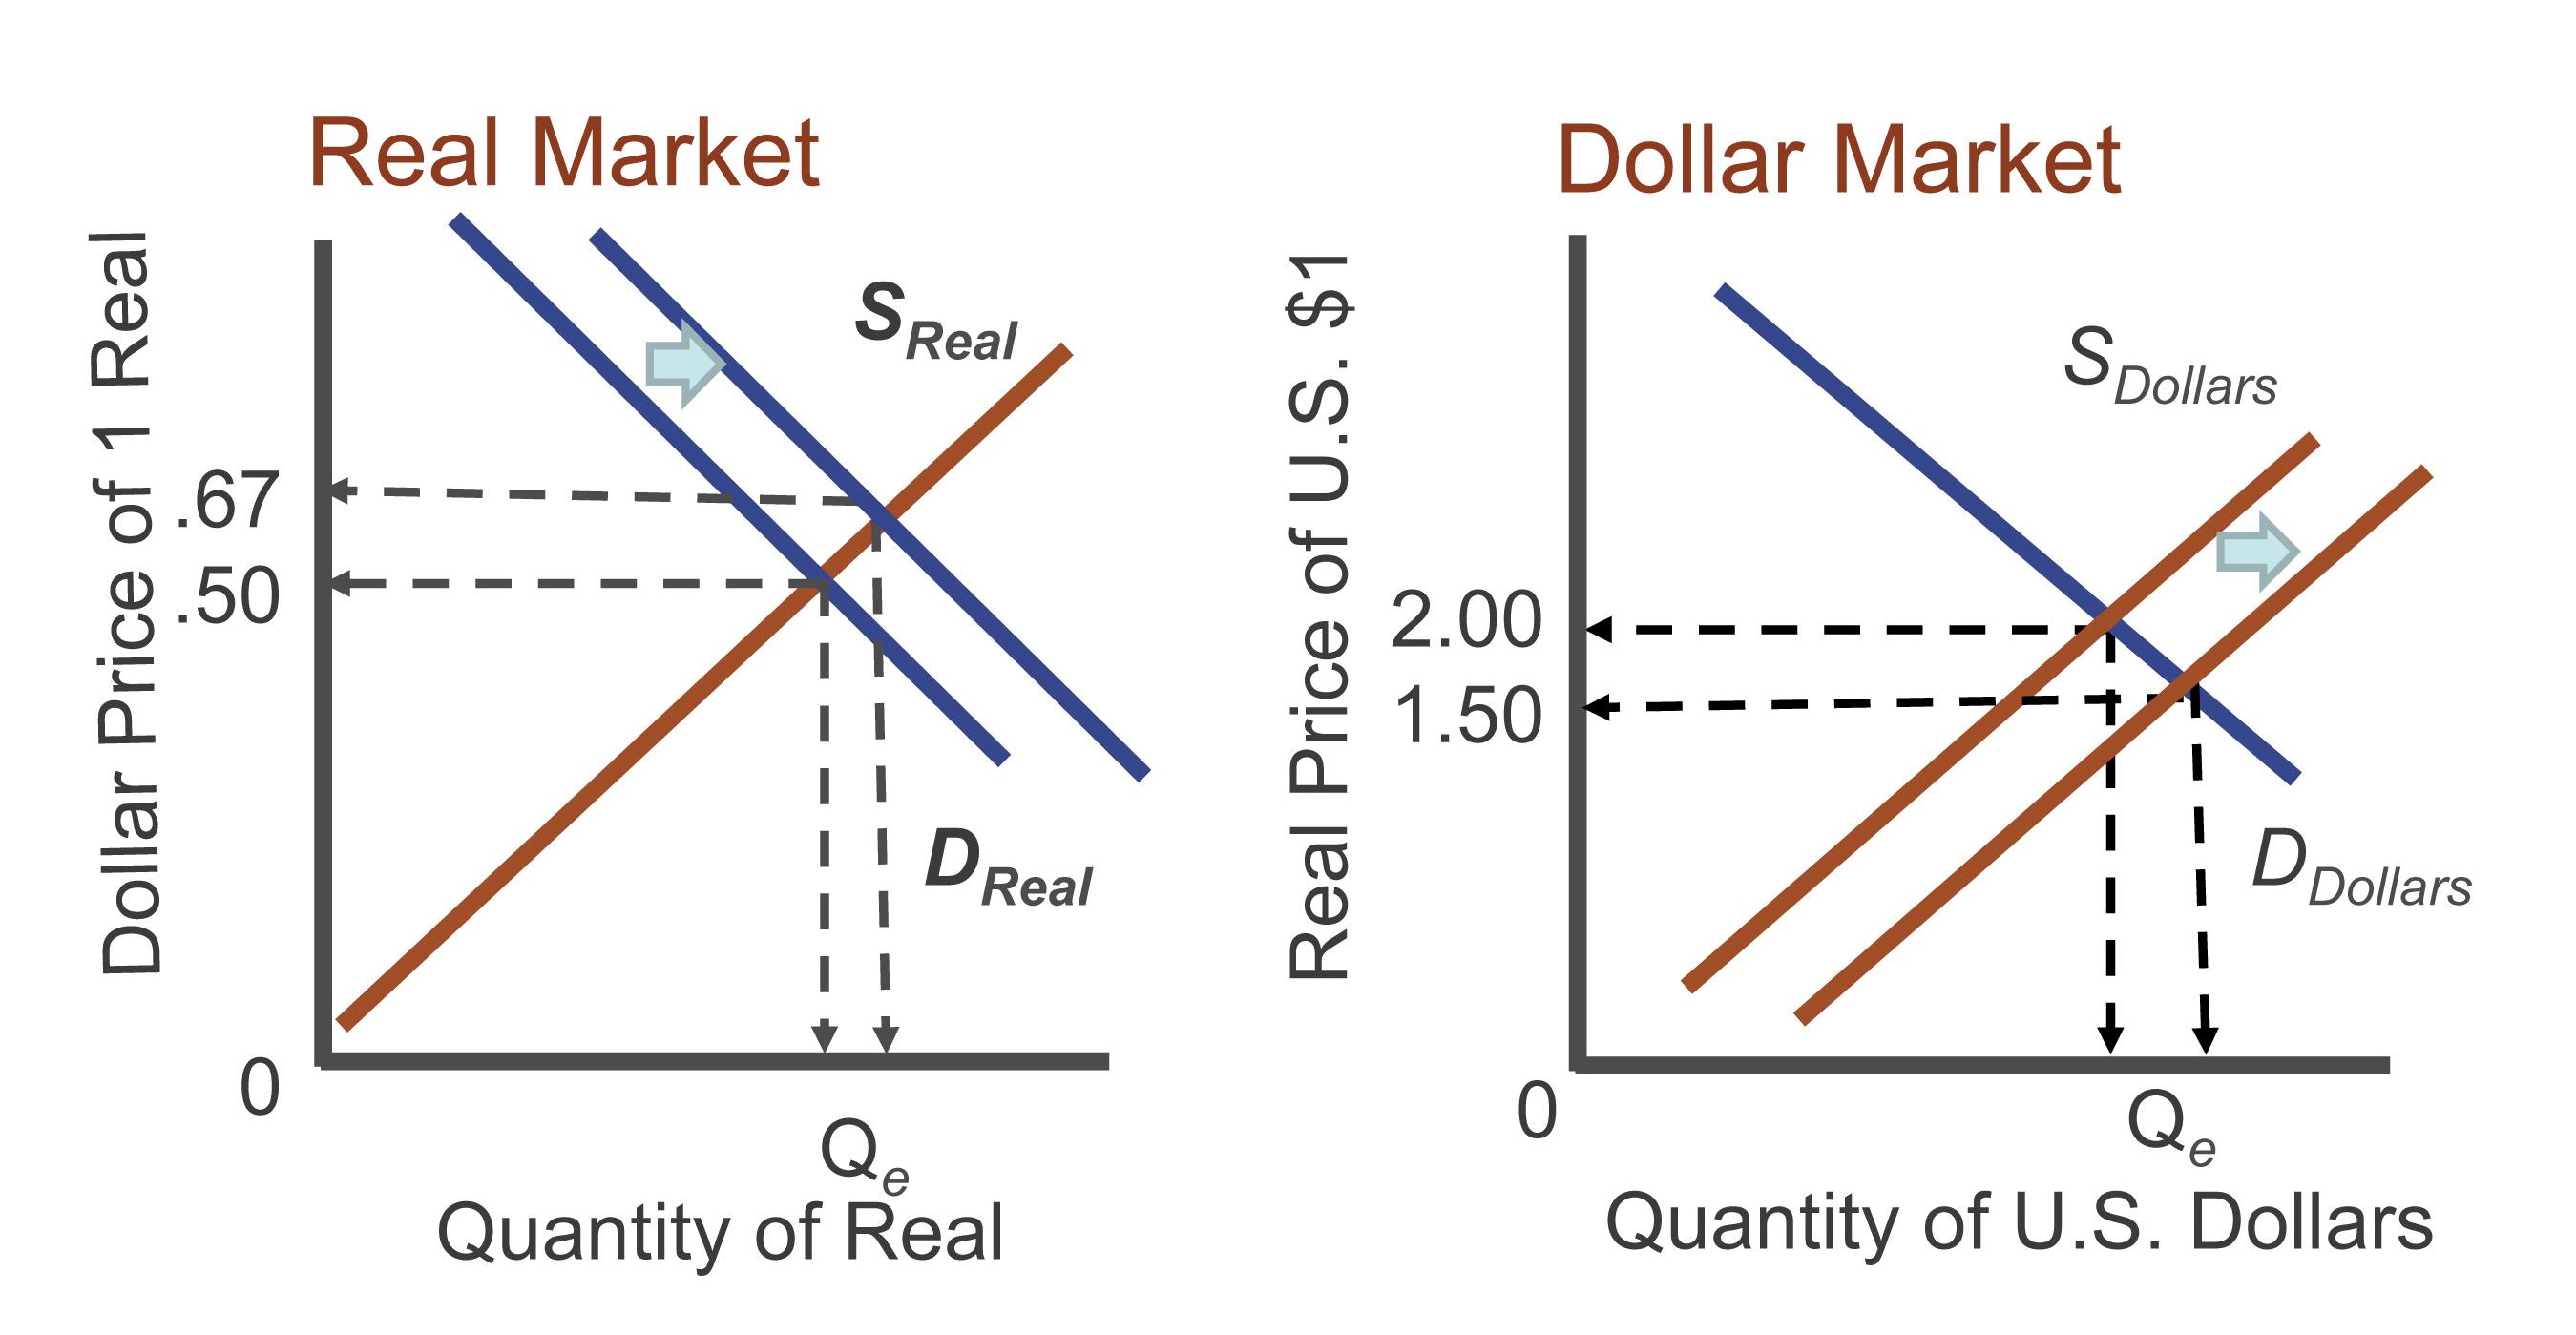 Foreign exchange market model